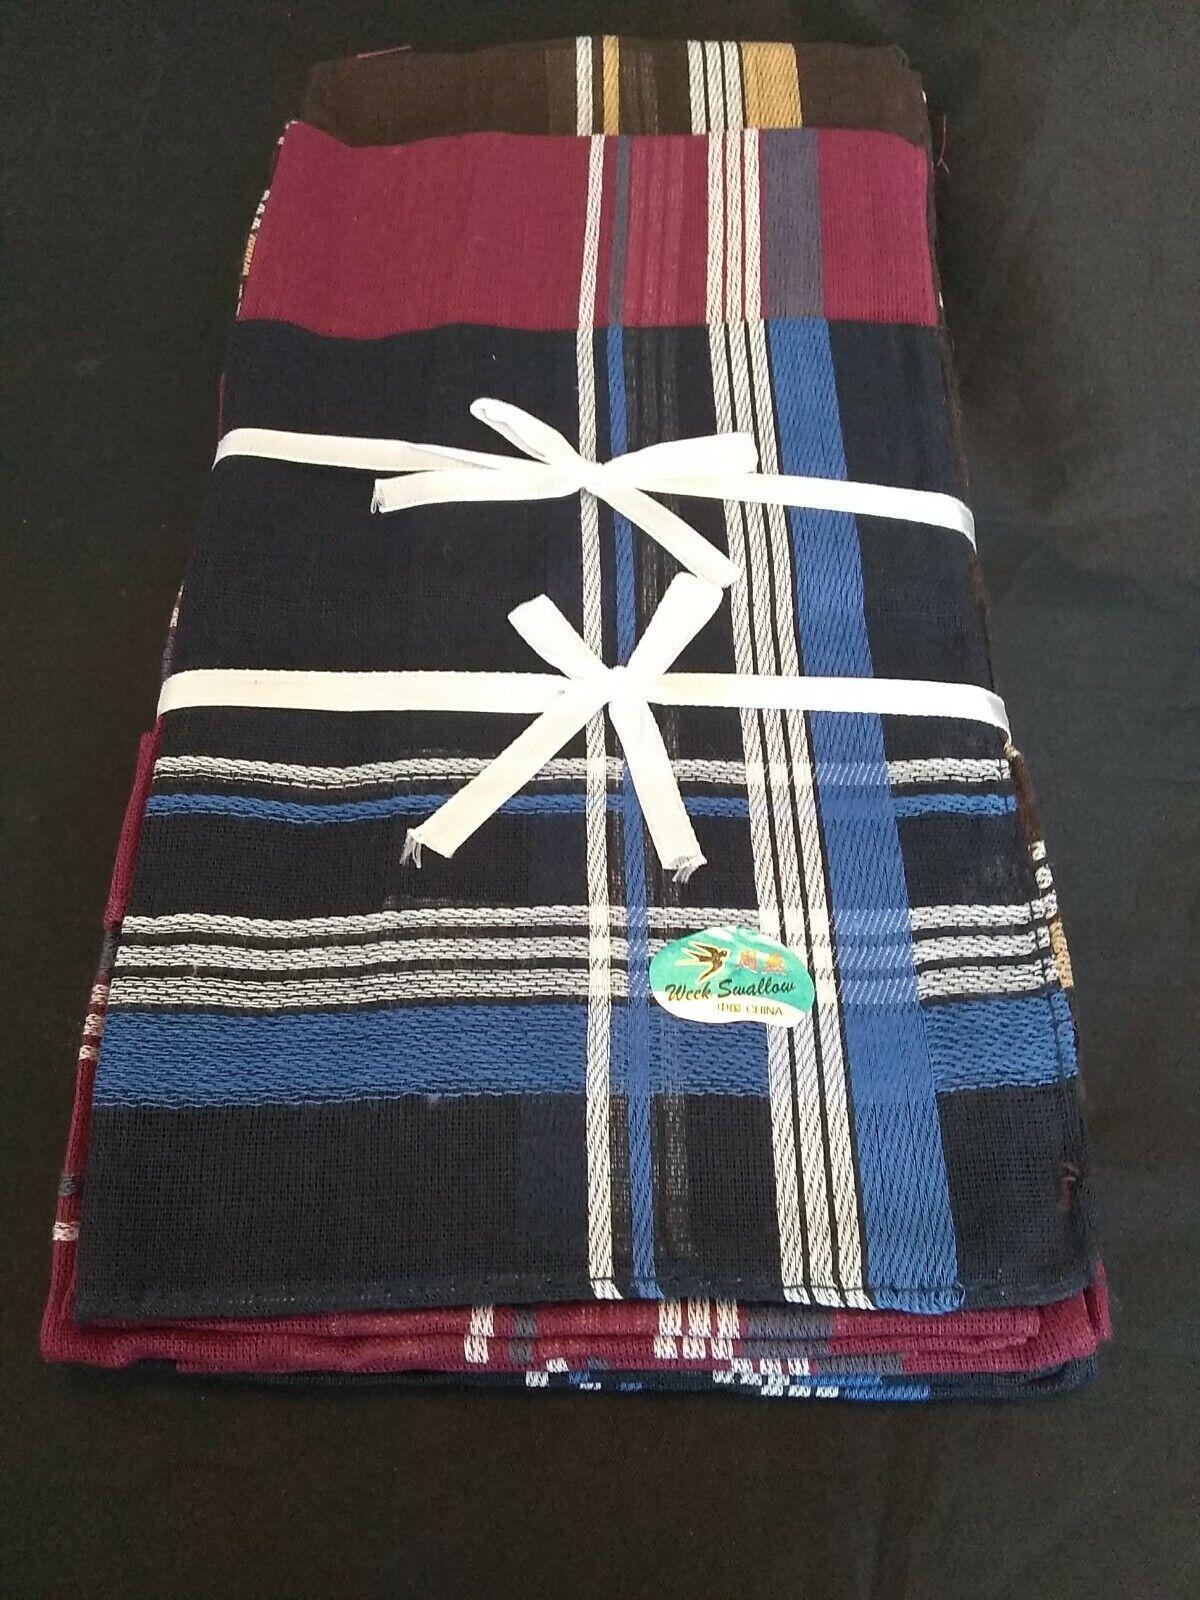 12 Mens Handkerchiefs Hankies Hanky Cloths 100% Cotton 13